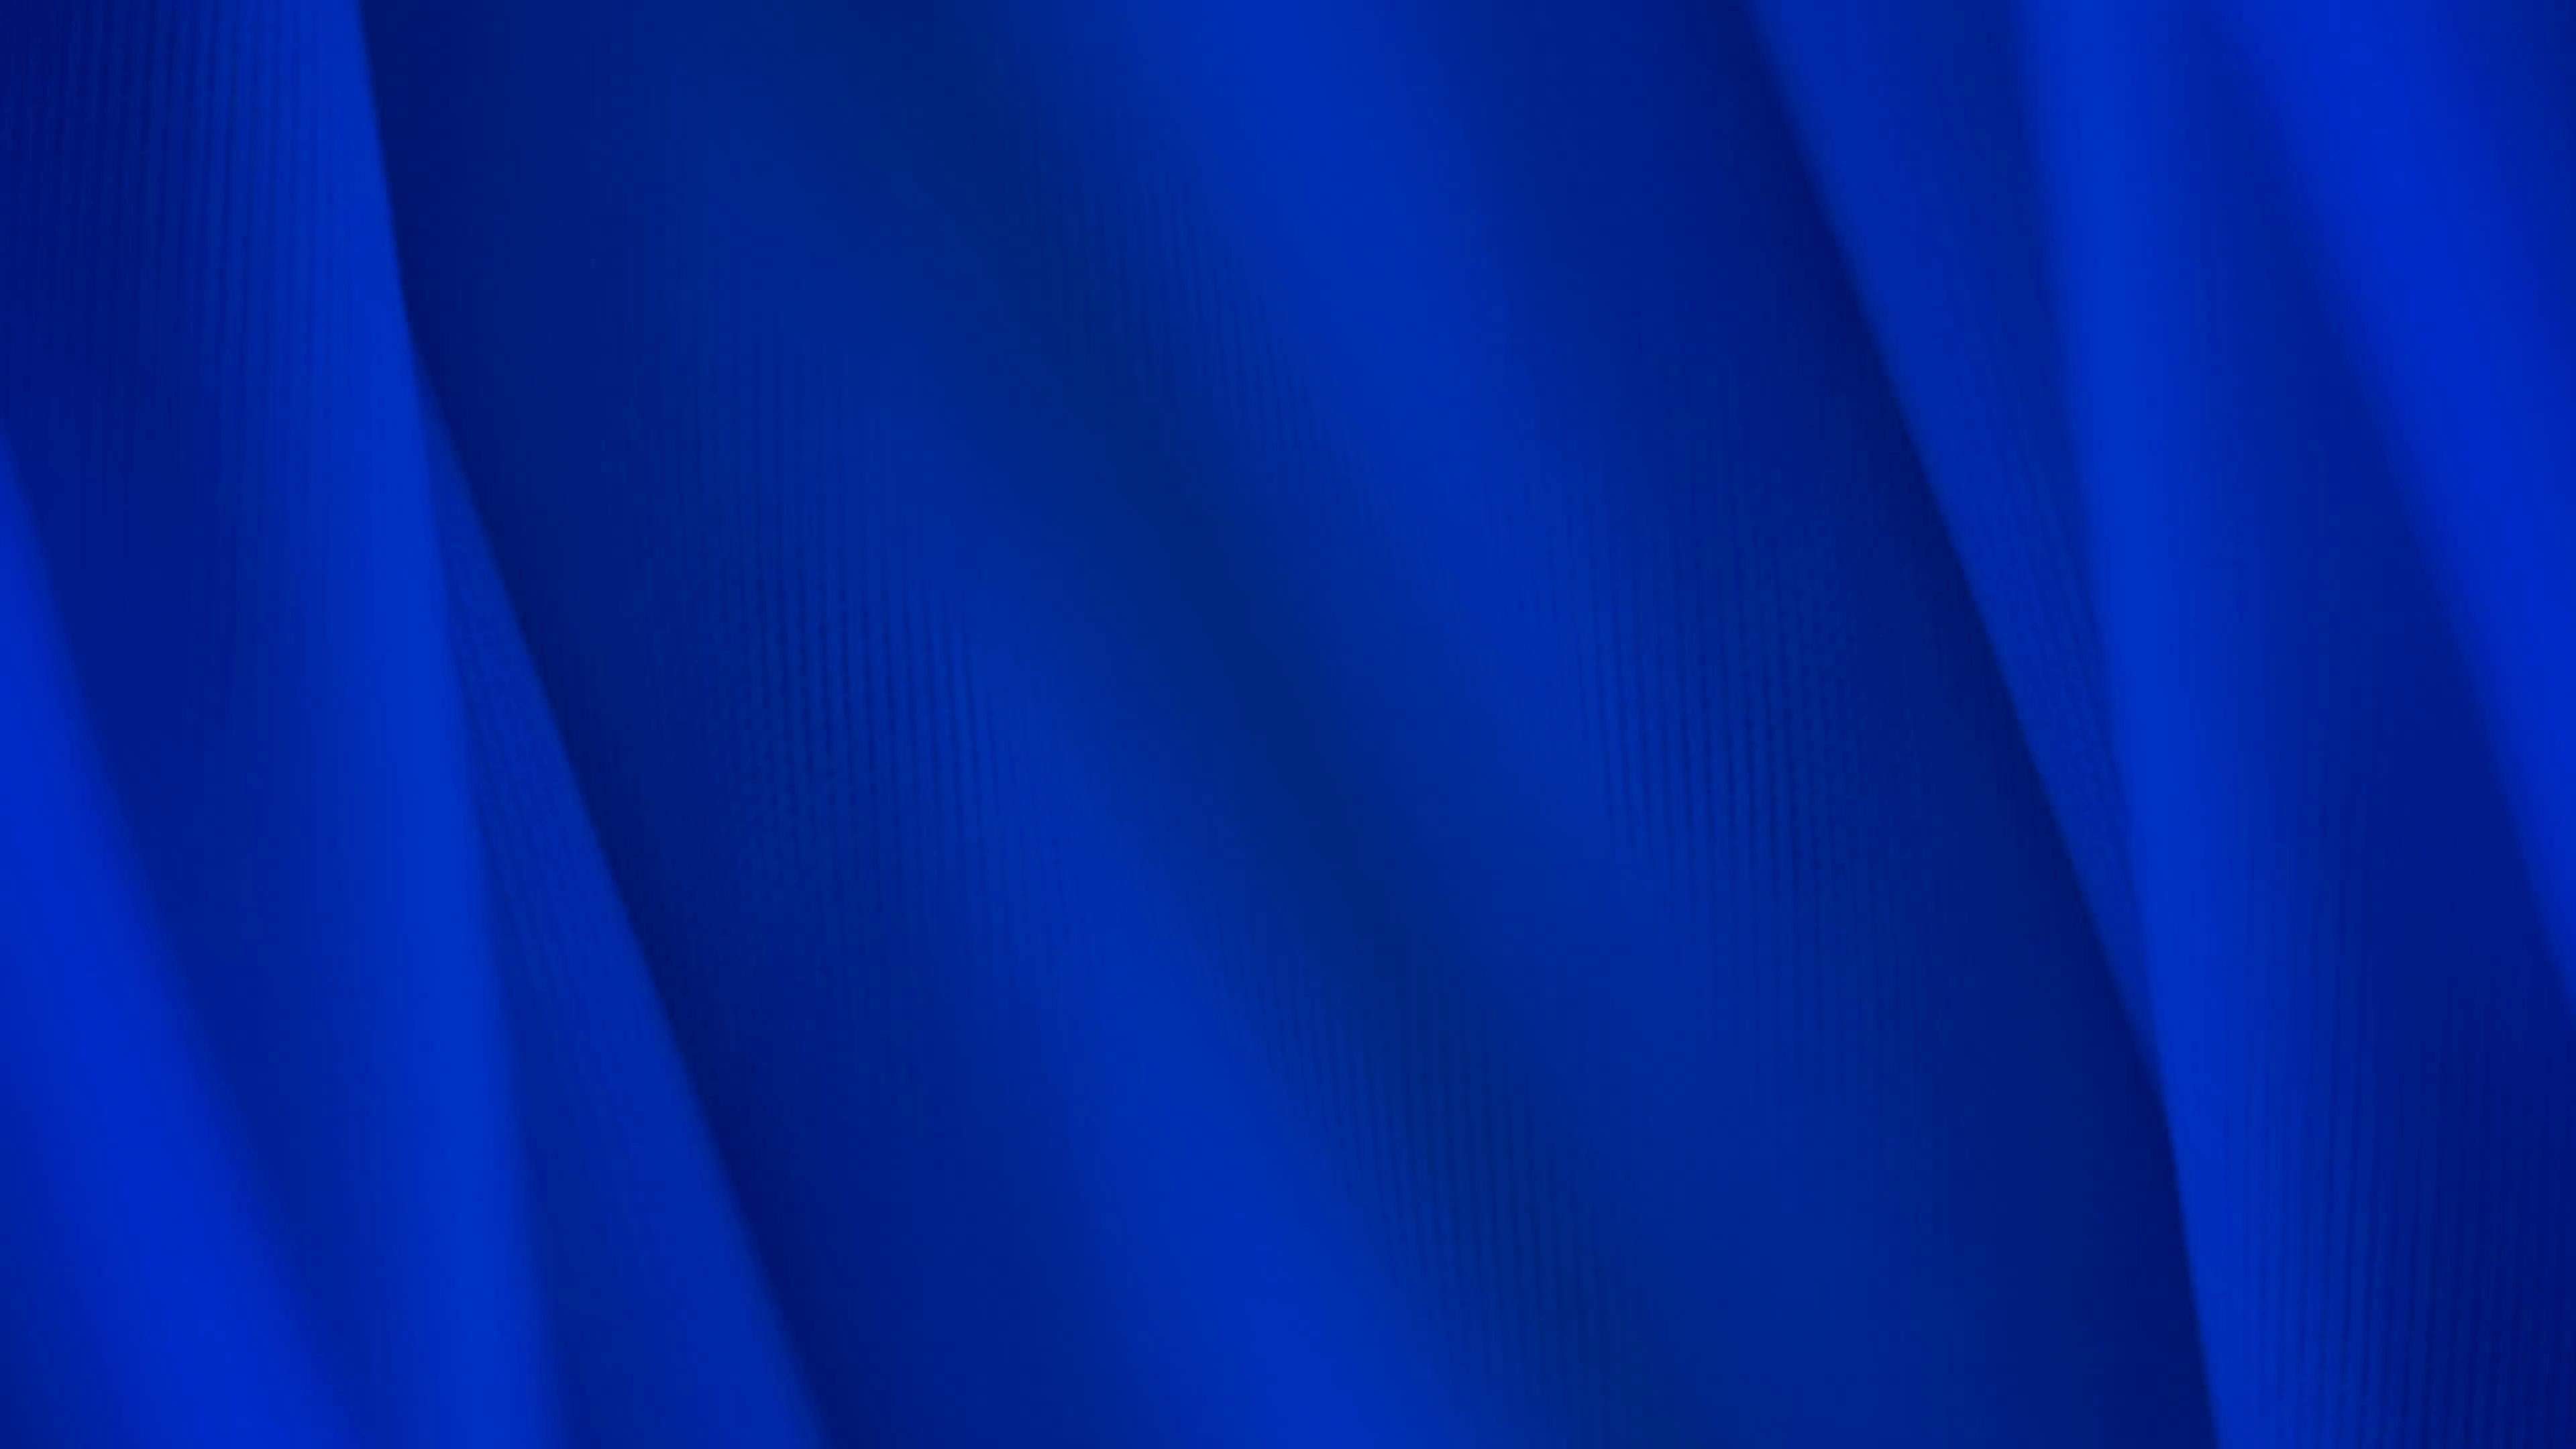 Dark Blue Backgrounds Wallpaper Cave